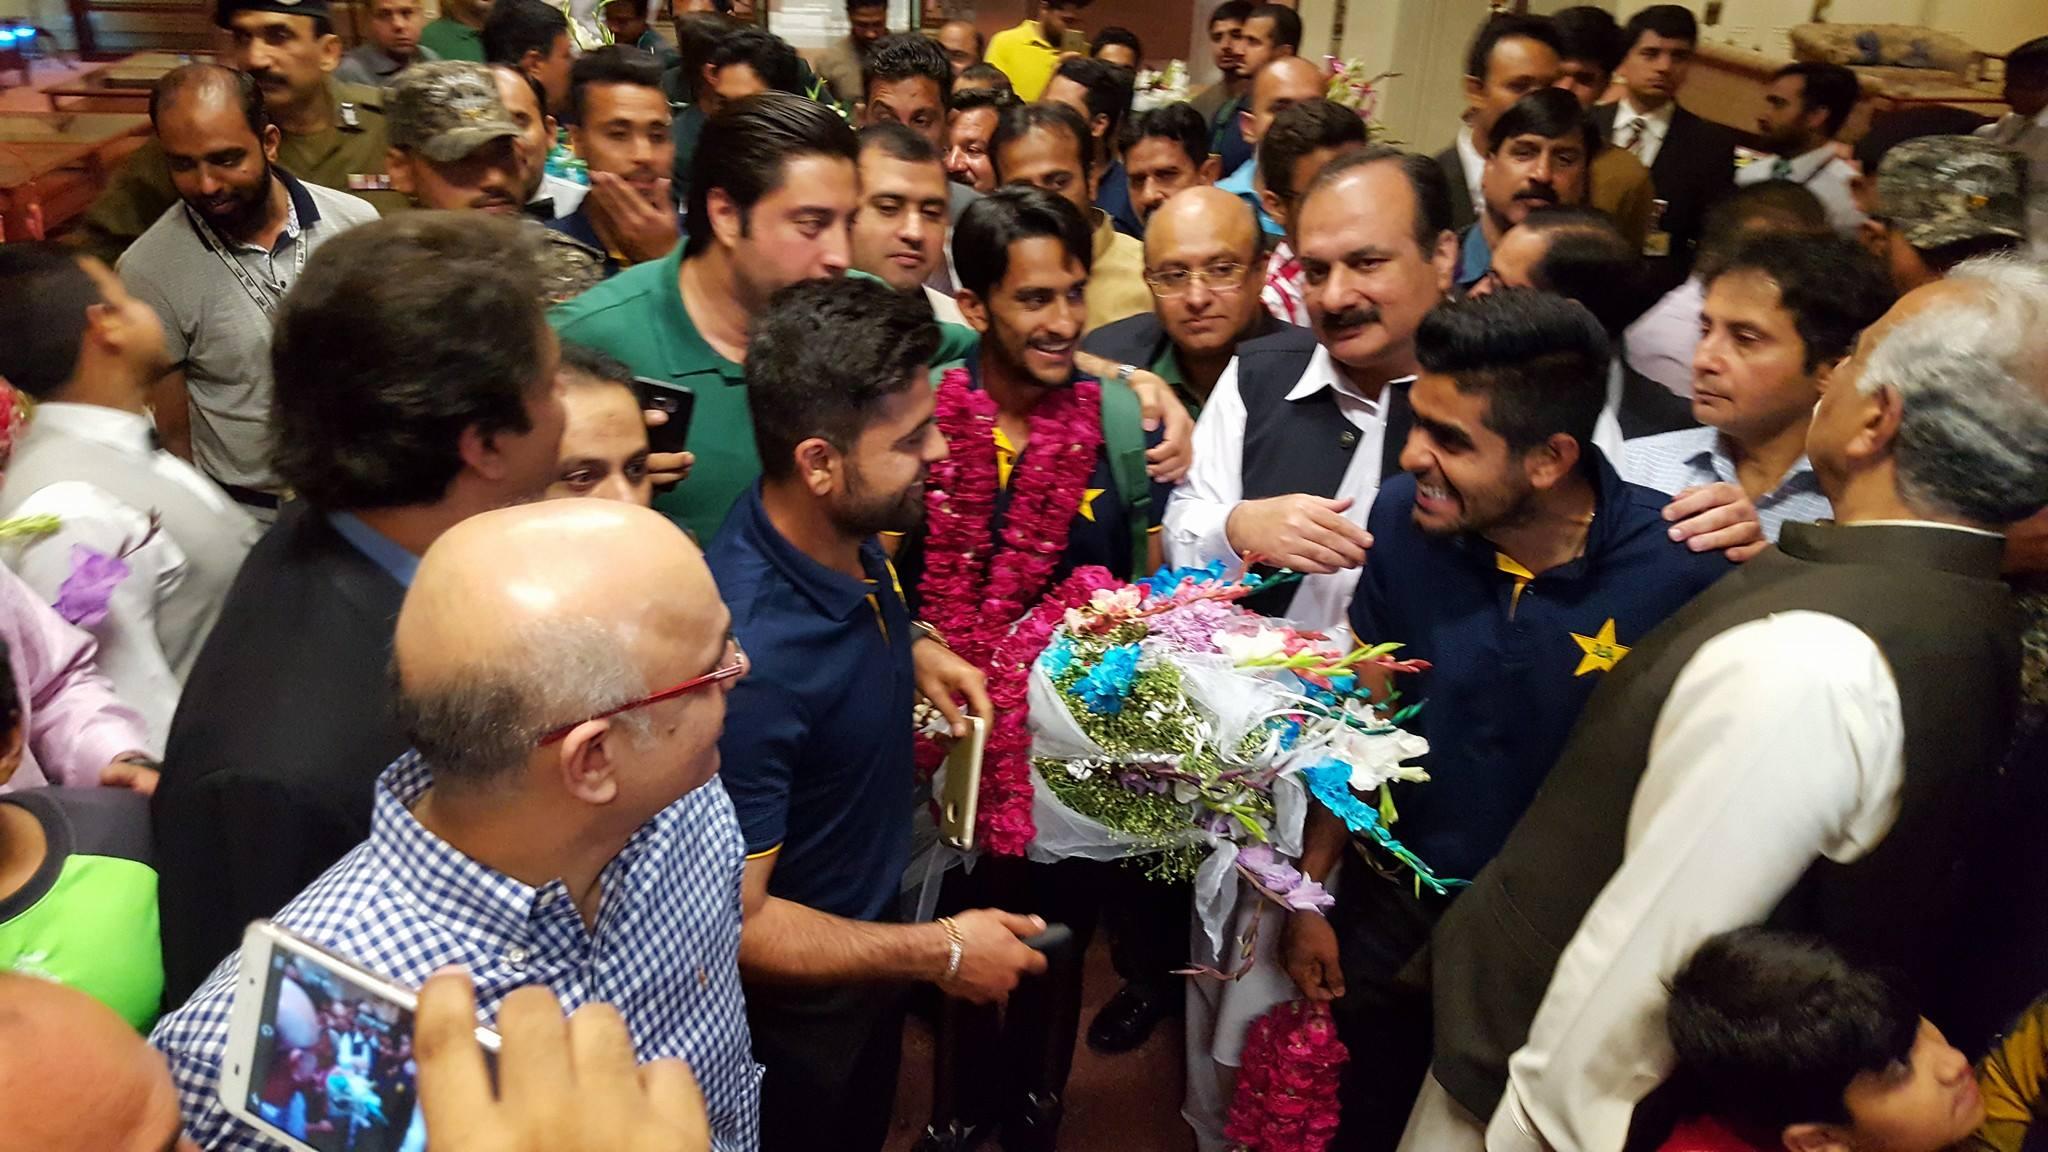 Pakistan News - Players Surrounded By Pakistani Fans